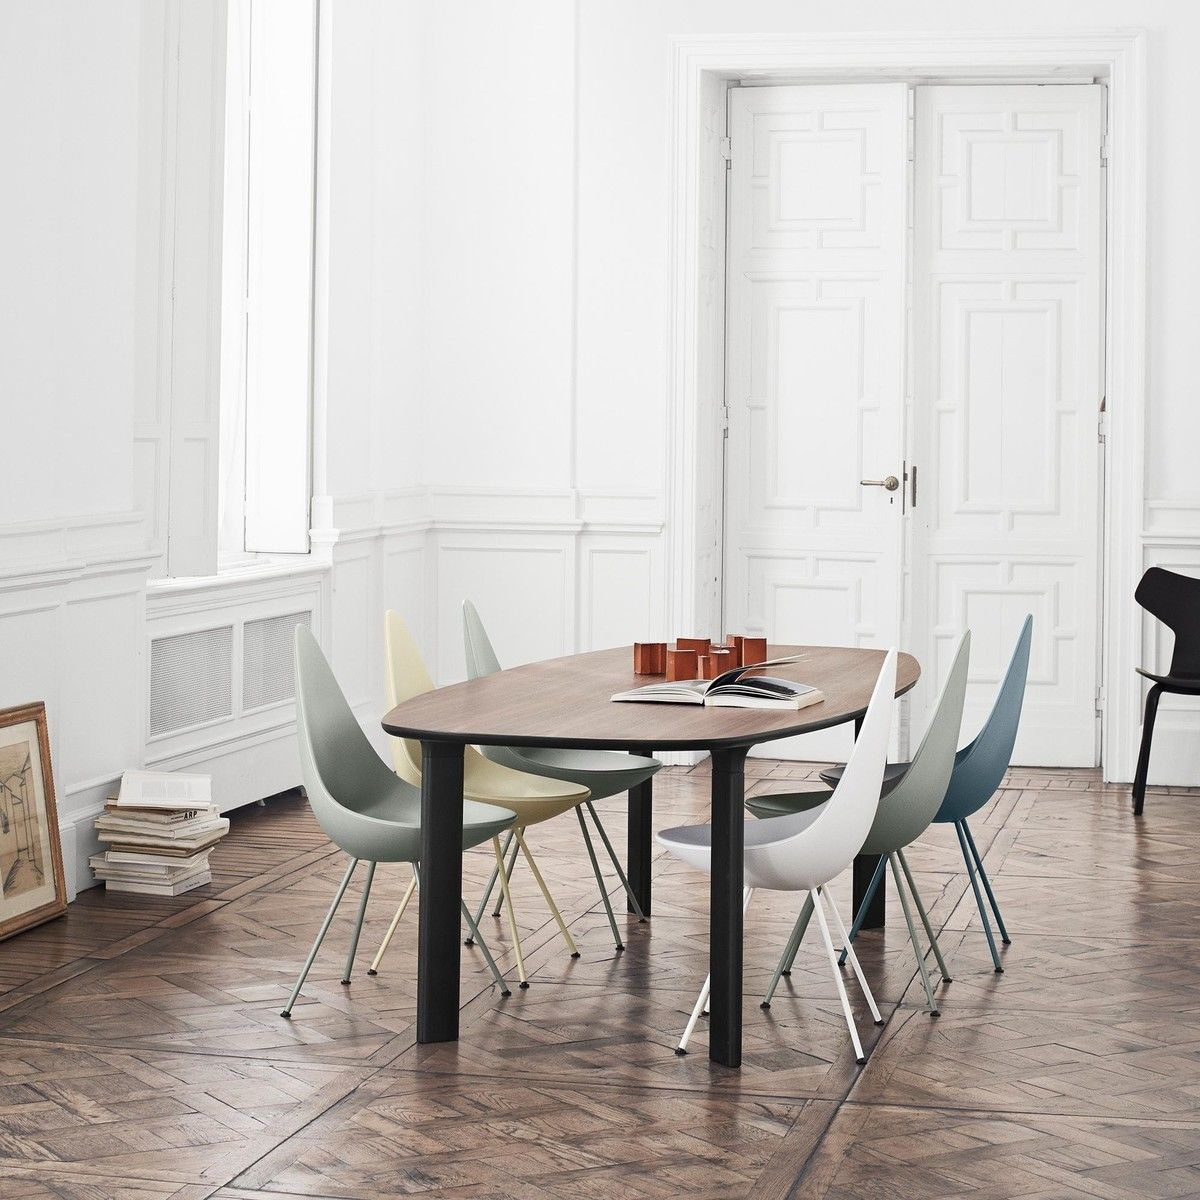 Arne jacobsen drop chair - Fritz Hansen Analog Dining Table 6 Drop Chairs Set